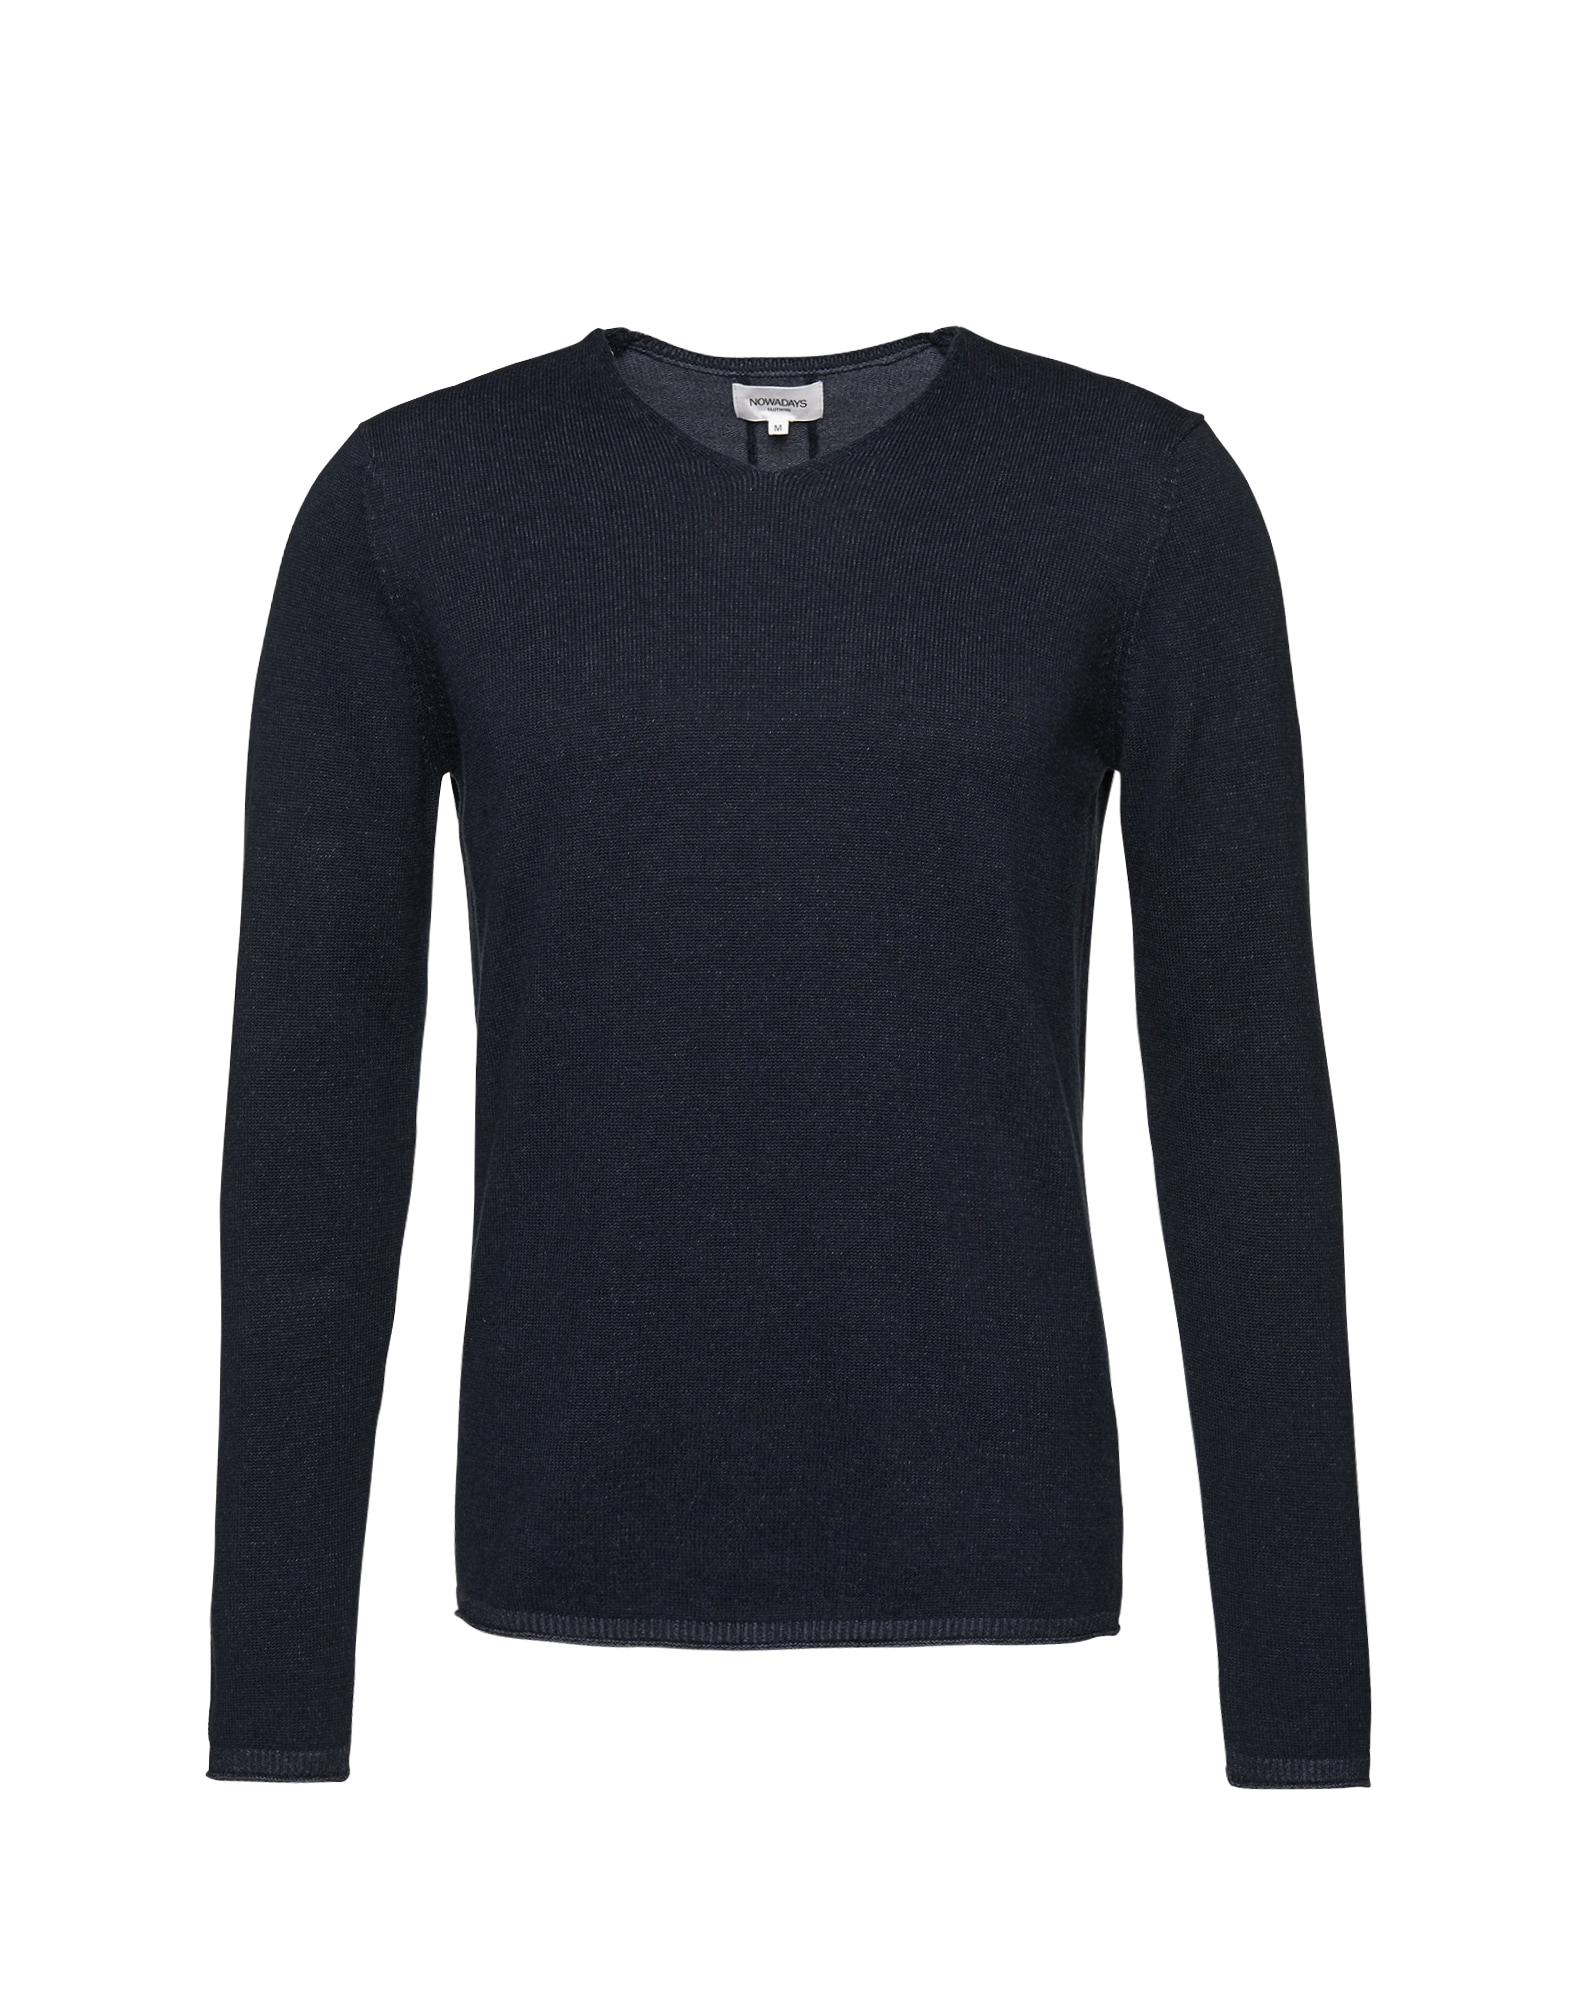 Svetr plated Pullover 9gg tmavě modrá NOWADAYS